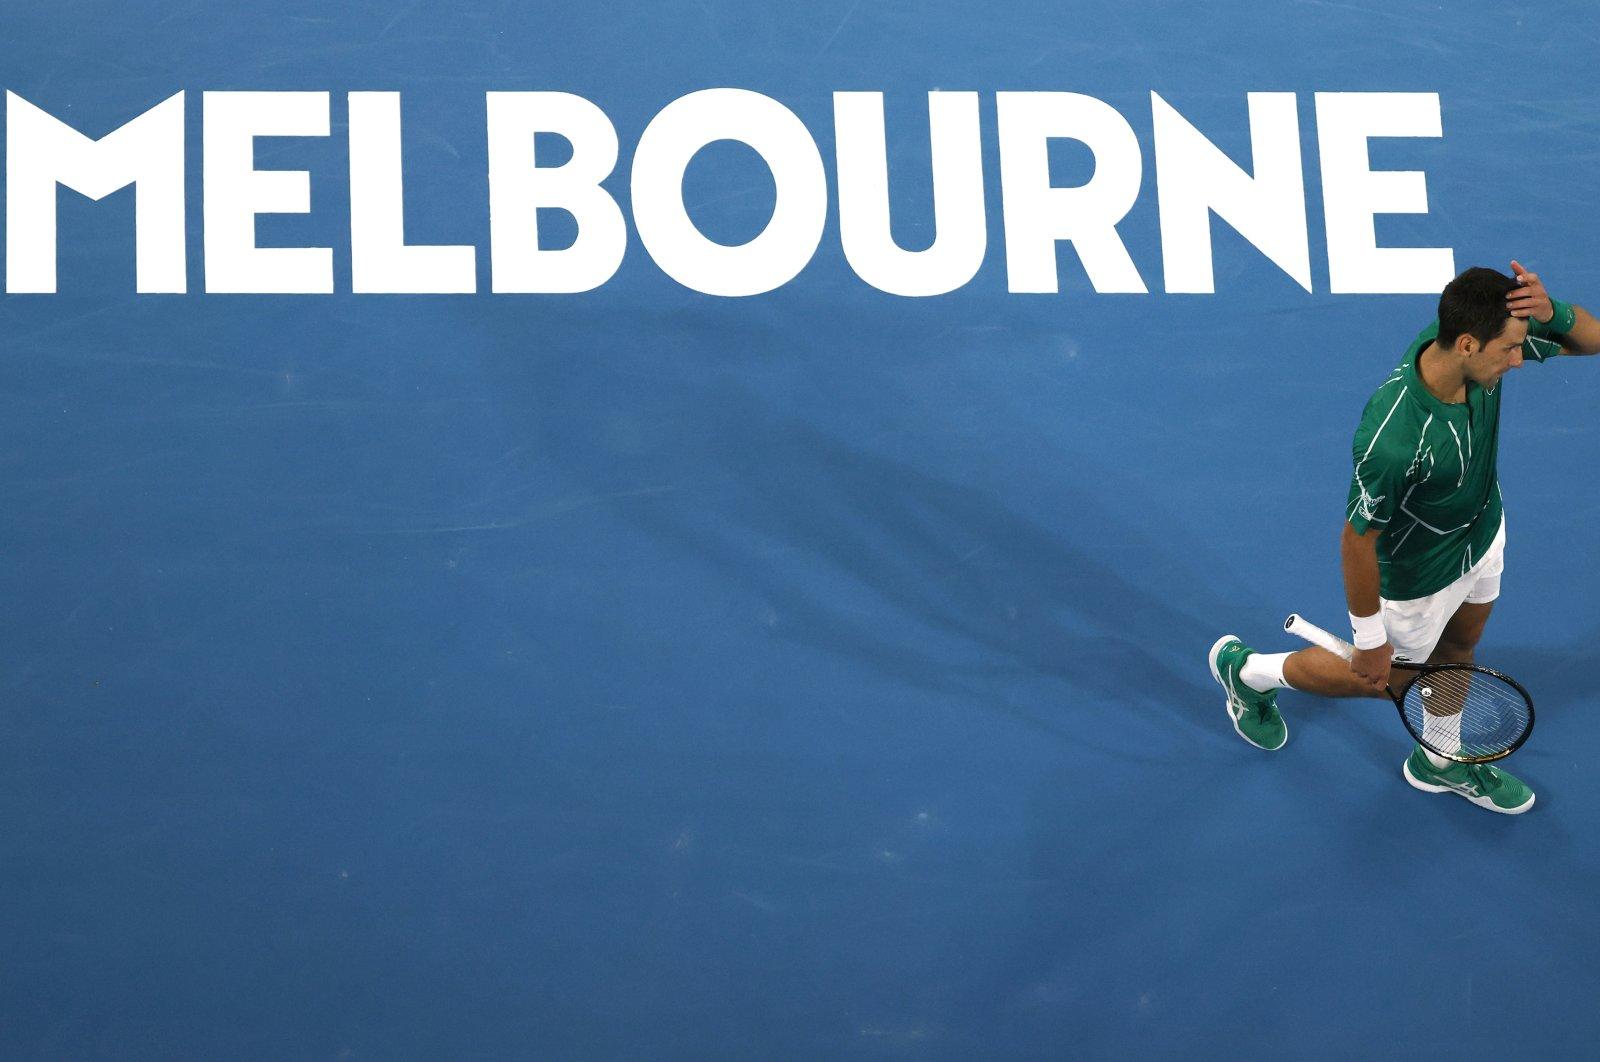 Novak Djokovic walks during the Australian Open final match against Dominic Thiem, in Melbourne, Australia, Feb. 2, 2020. (AP Photo)